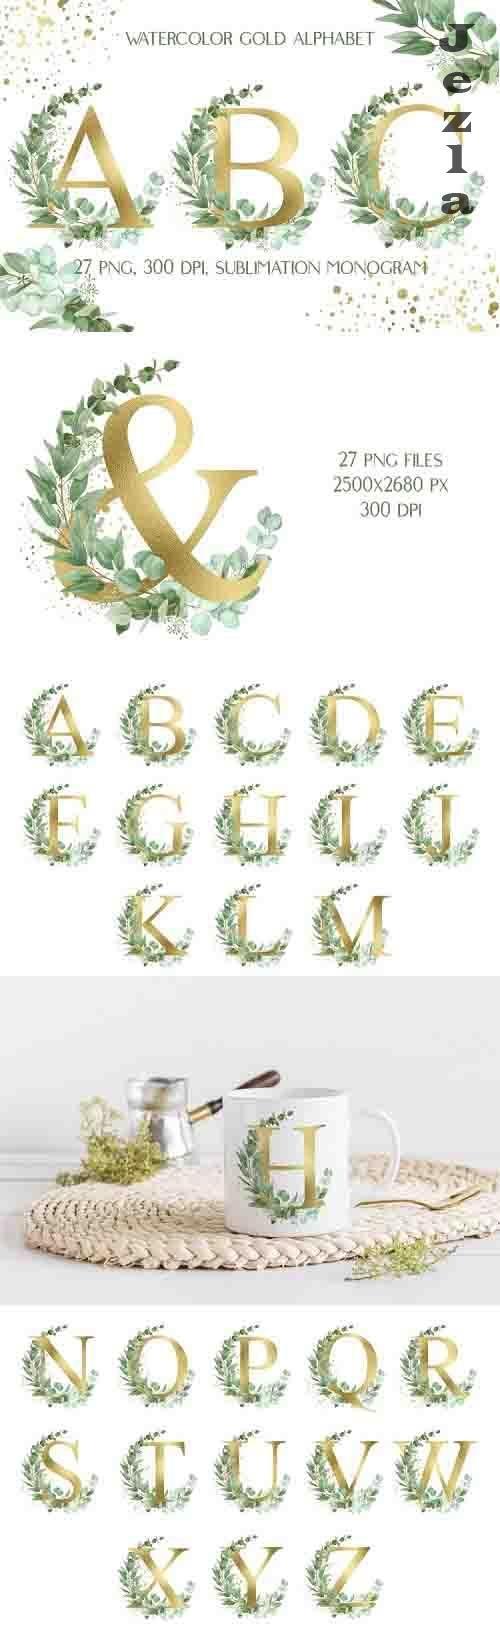 Sublimation Gold Alphabet | Eucalyptus Monogram Clip Art - 1238707